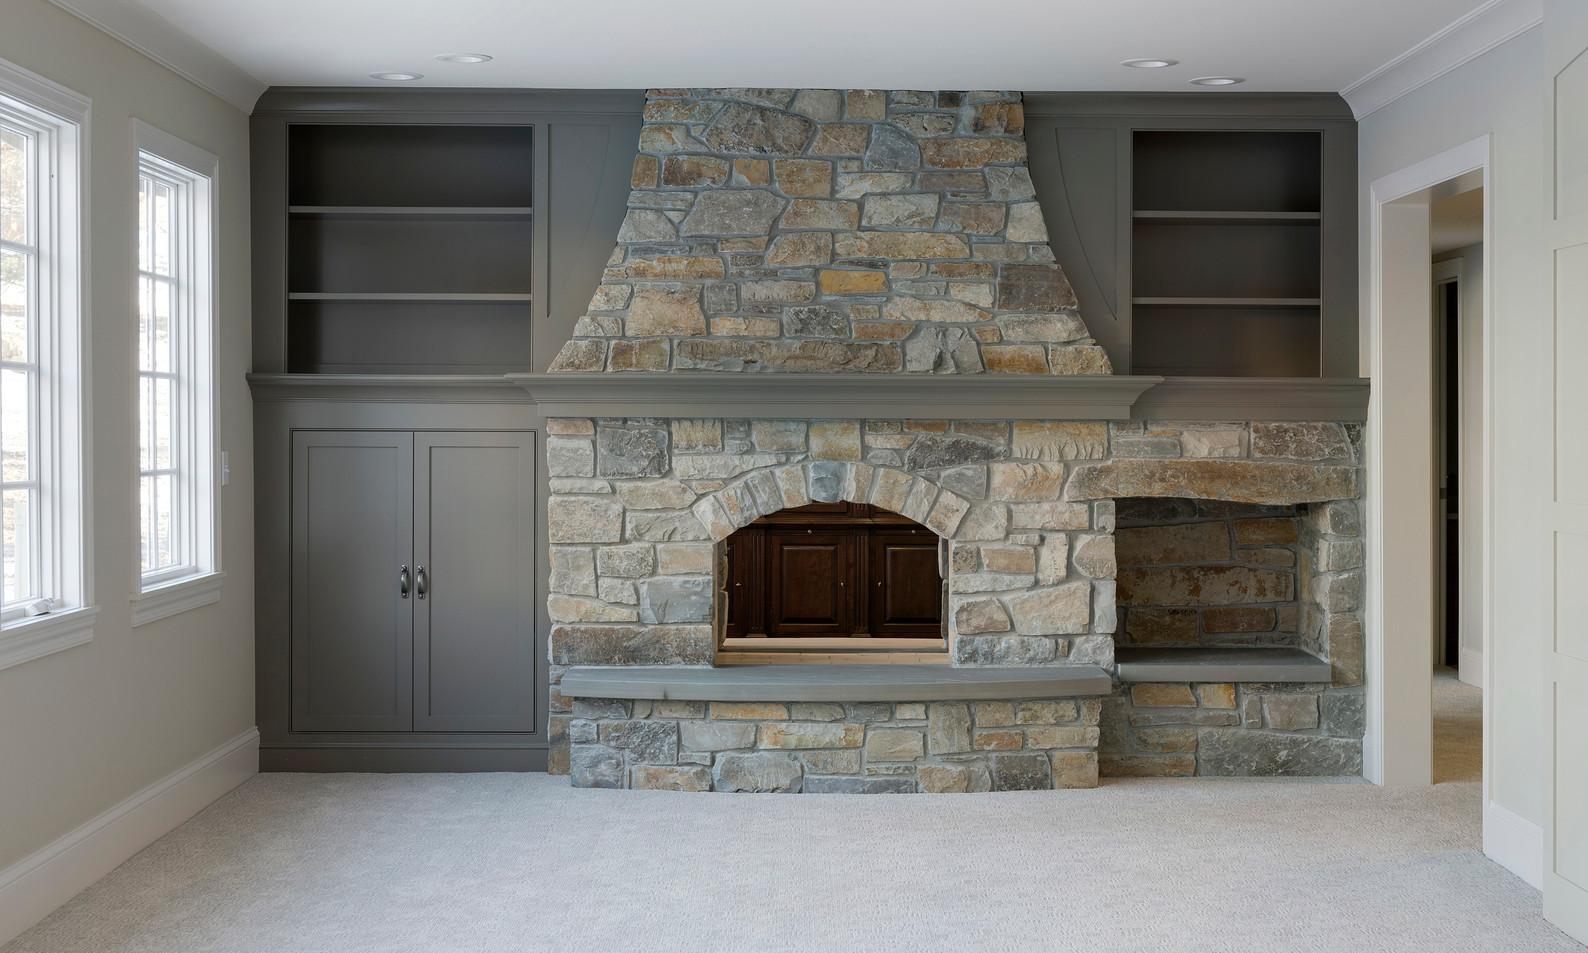 T_6804_fireplace.jpg